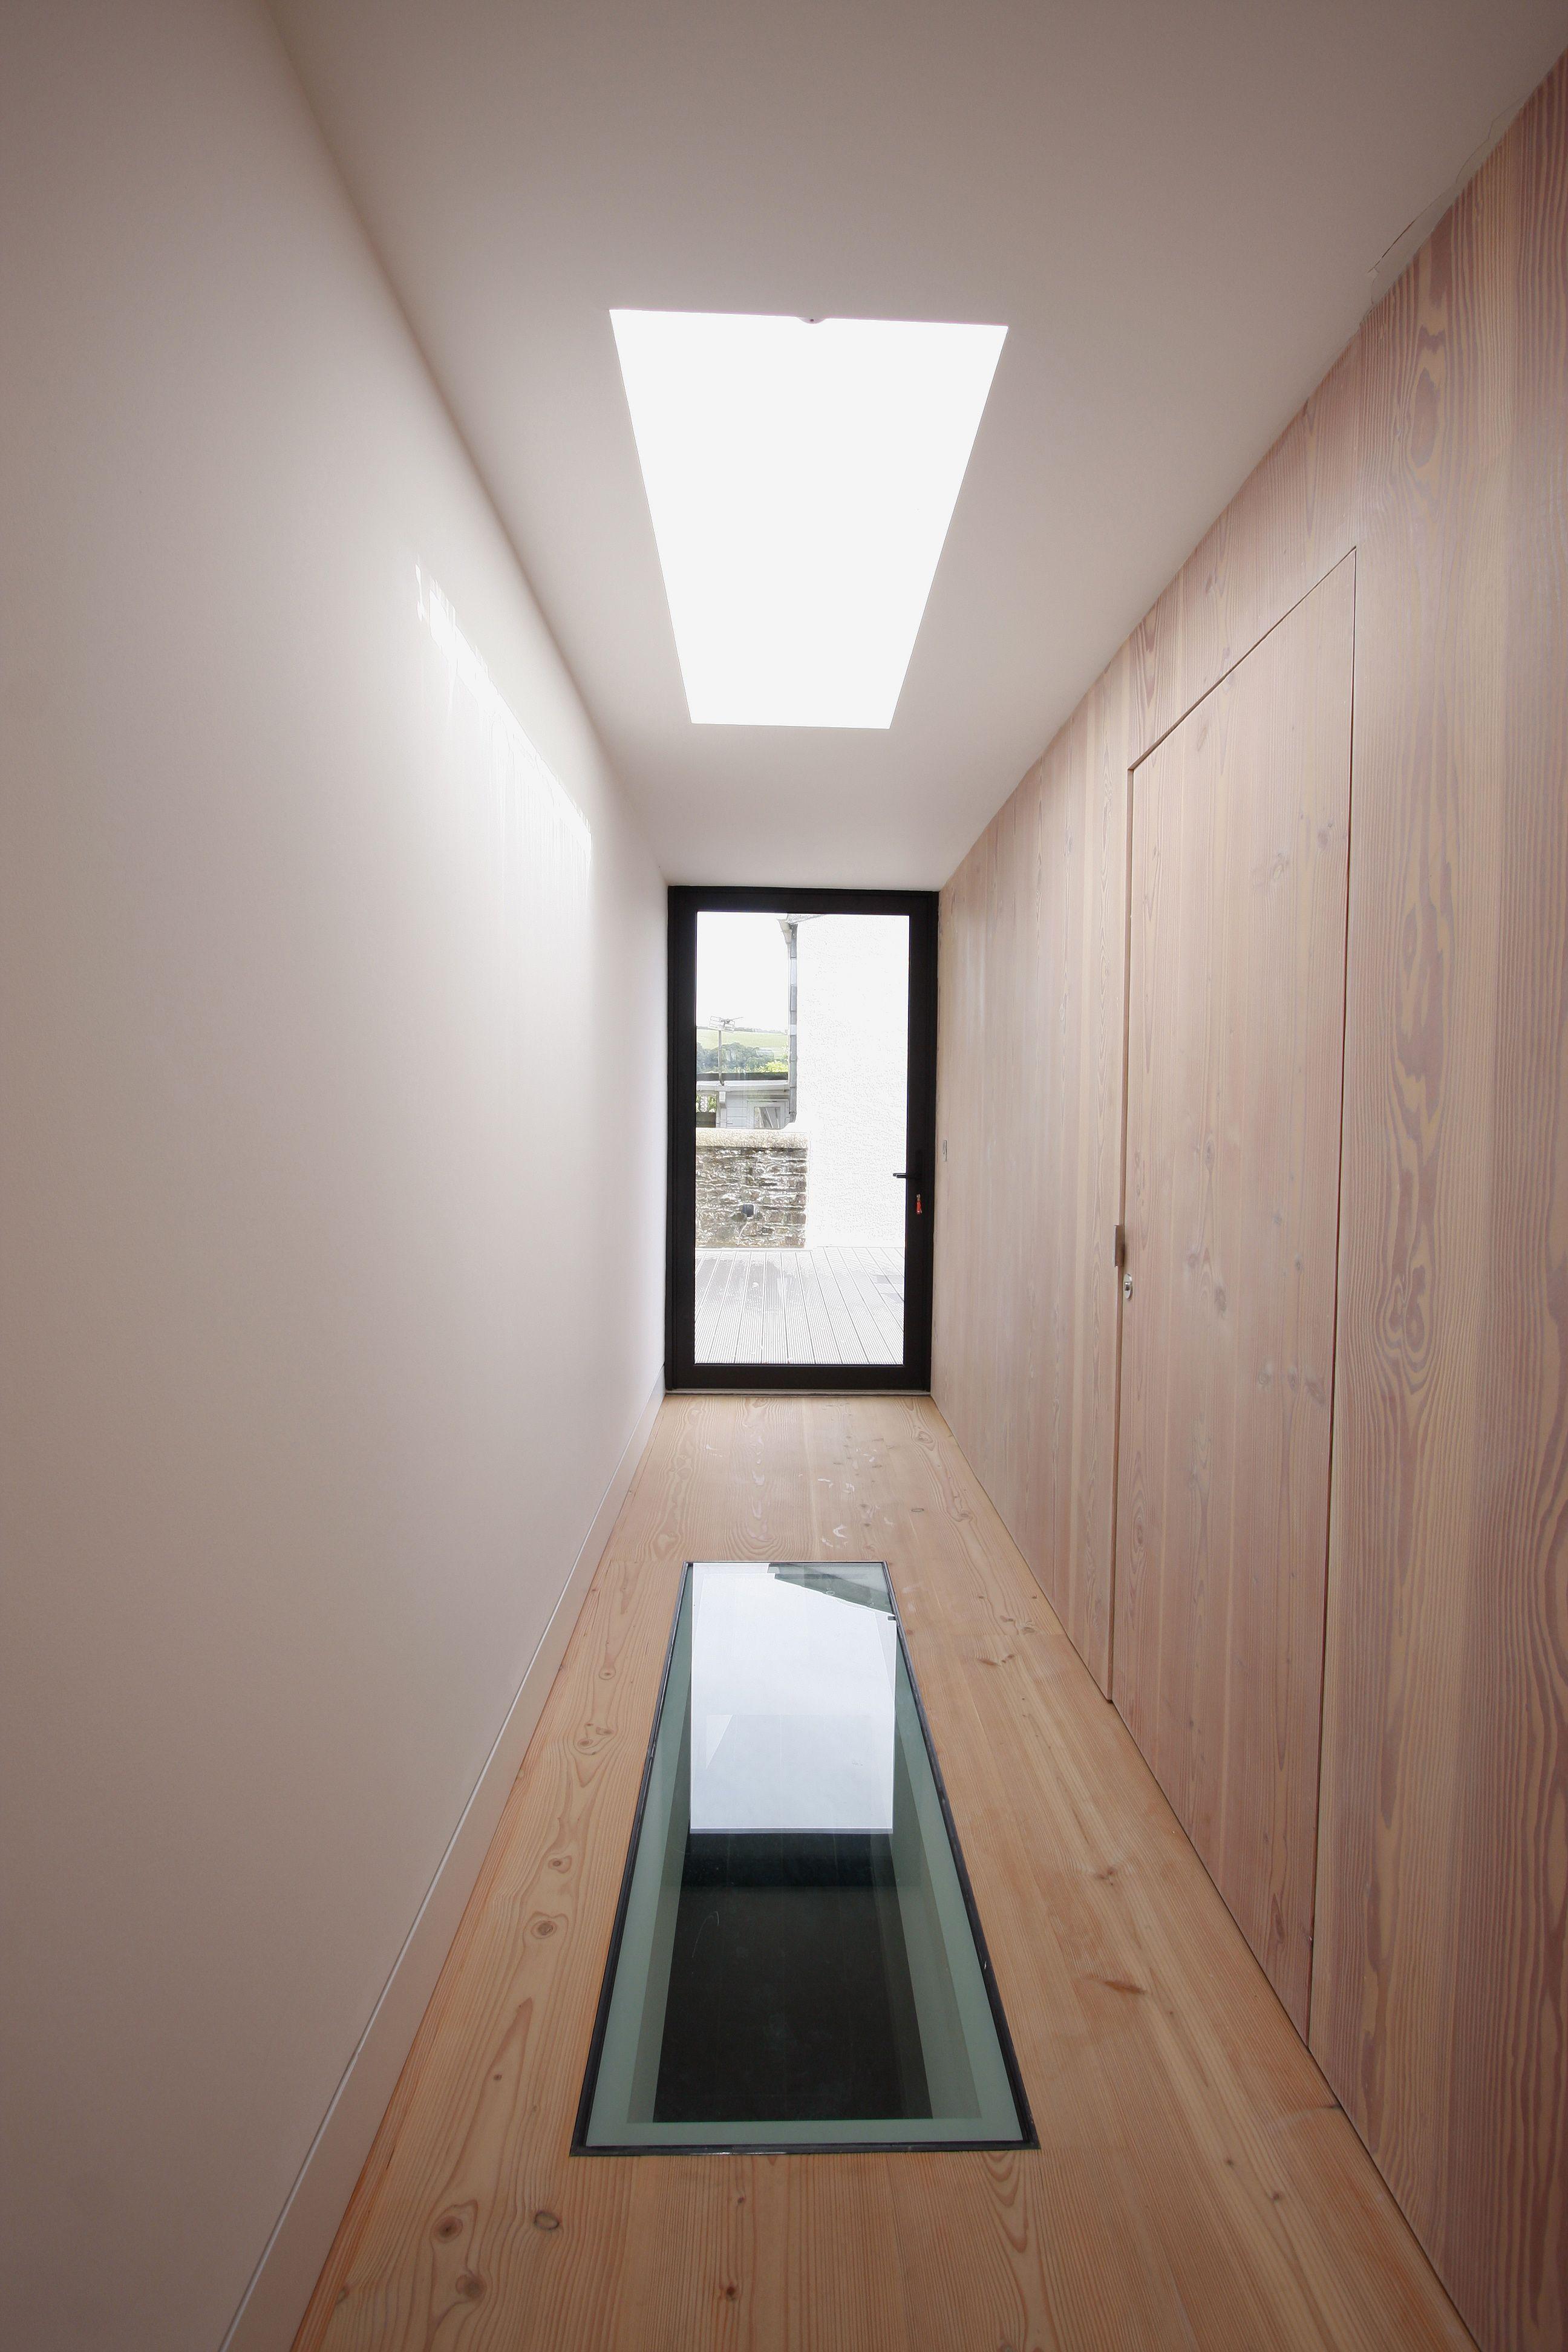 Aluminium Casement Doors Provide External Access On Smaller Openings